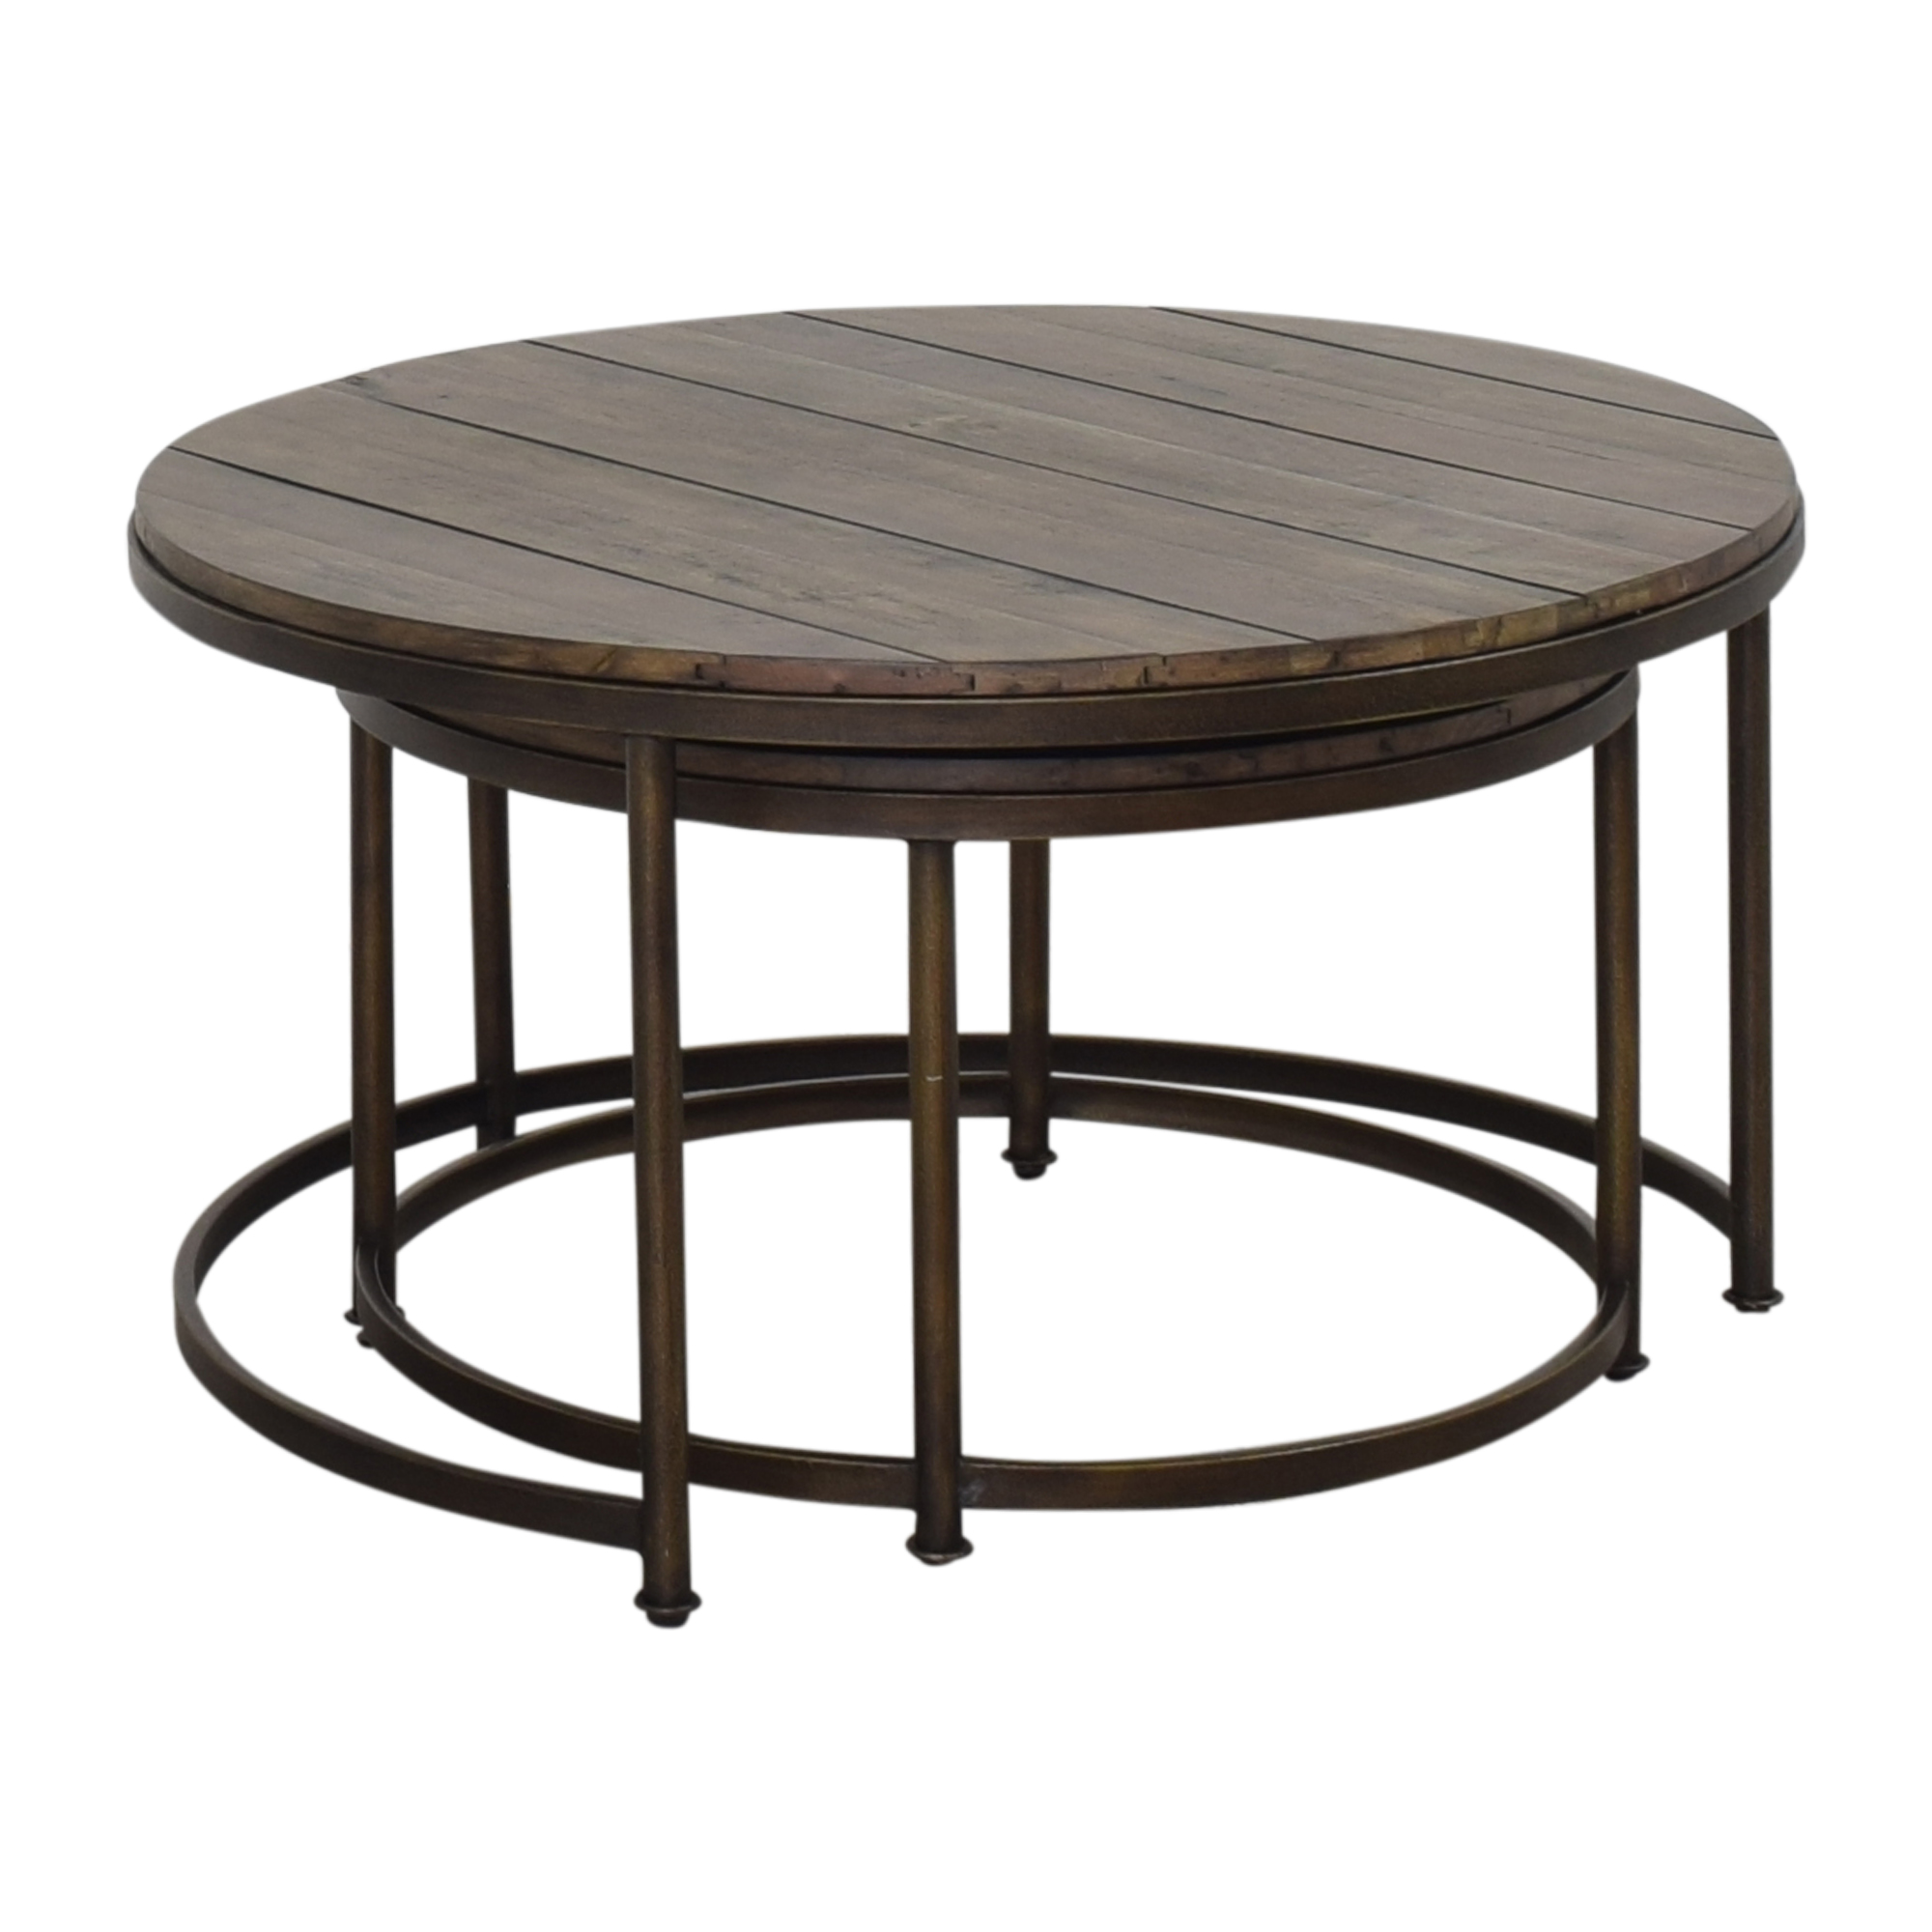 Furniture of America  Furniture of America Nesting Coffee Tables ma